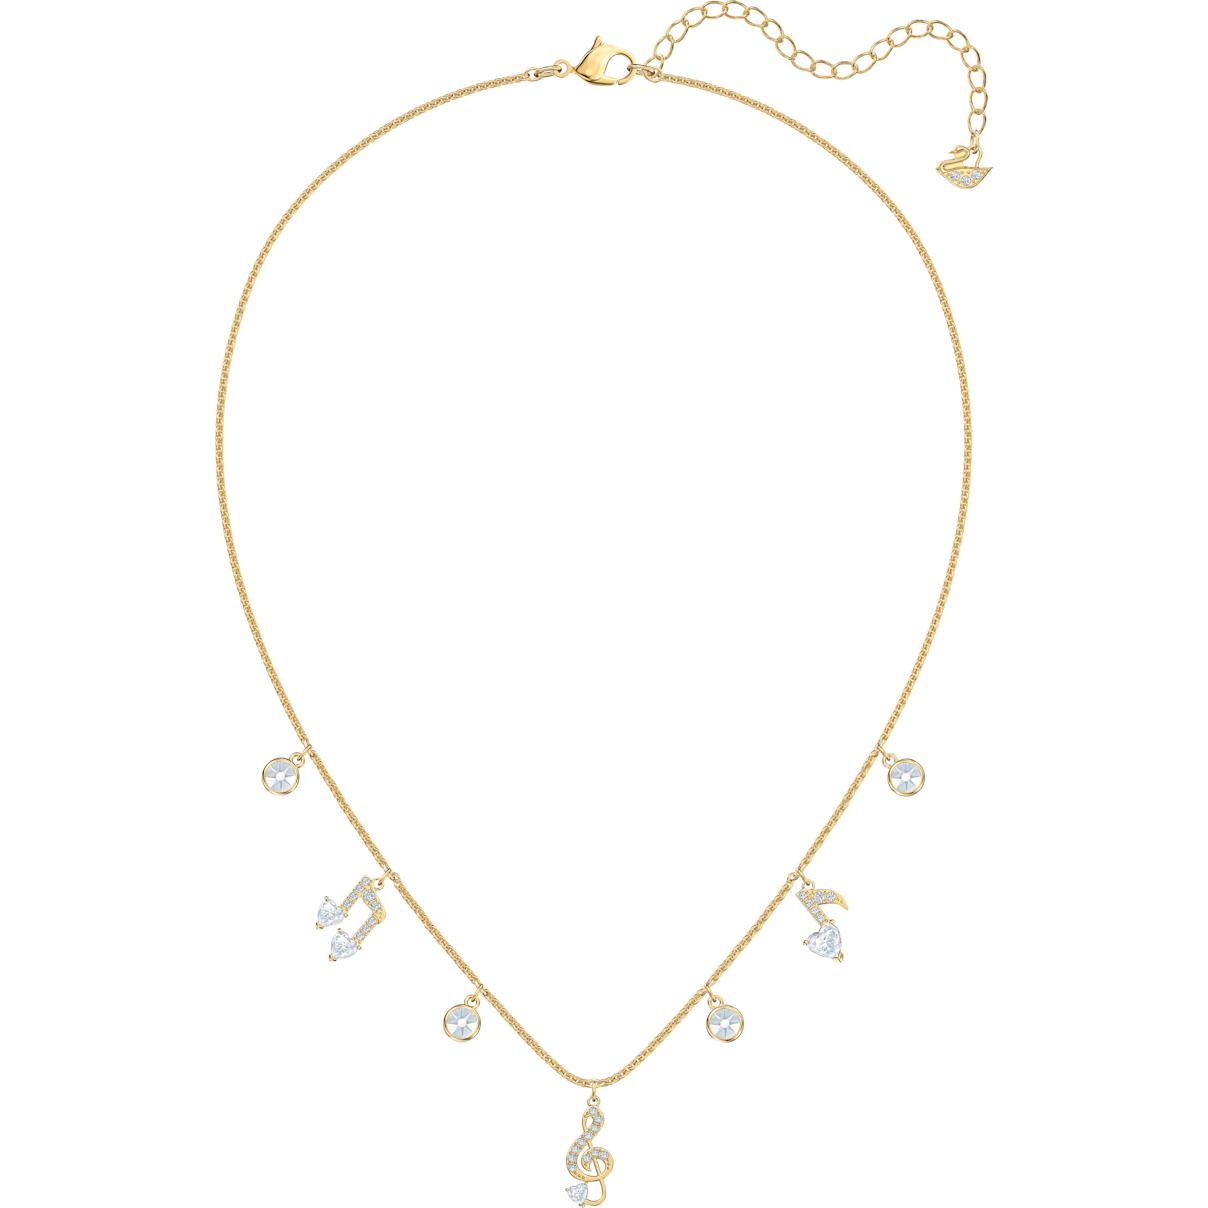 Swarovski Pleasant Necklace, White, Gold-tone plated